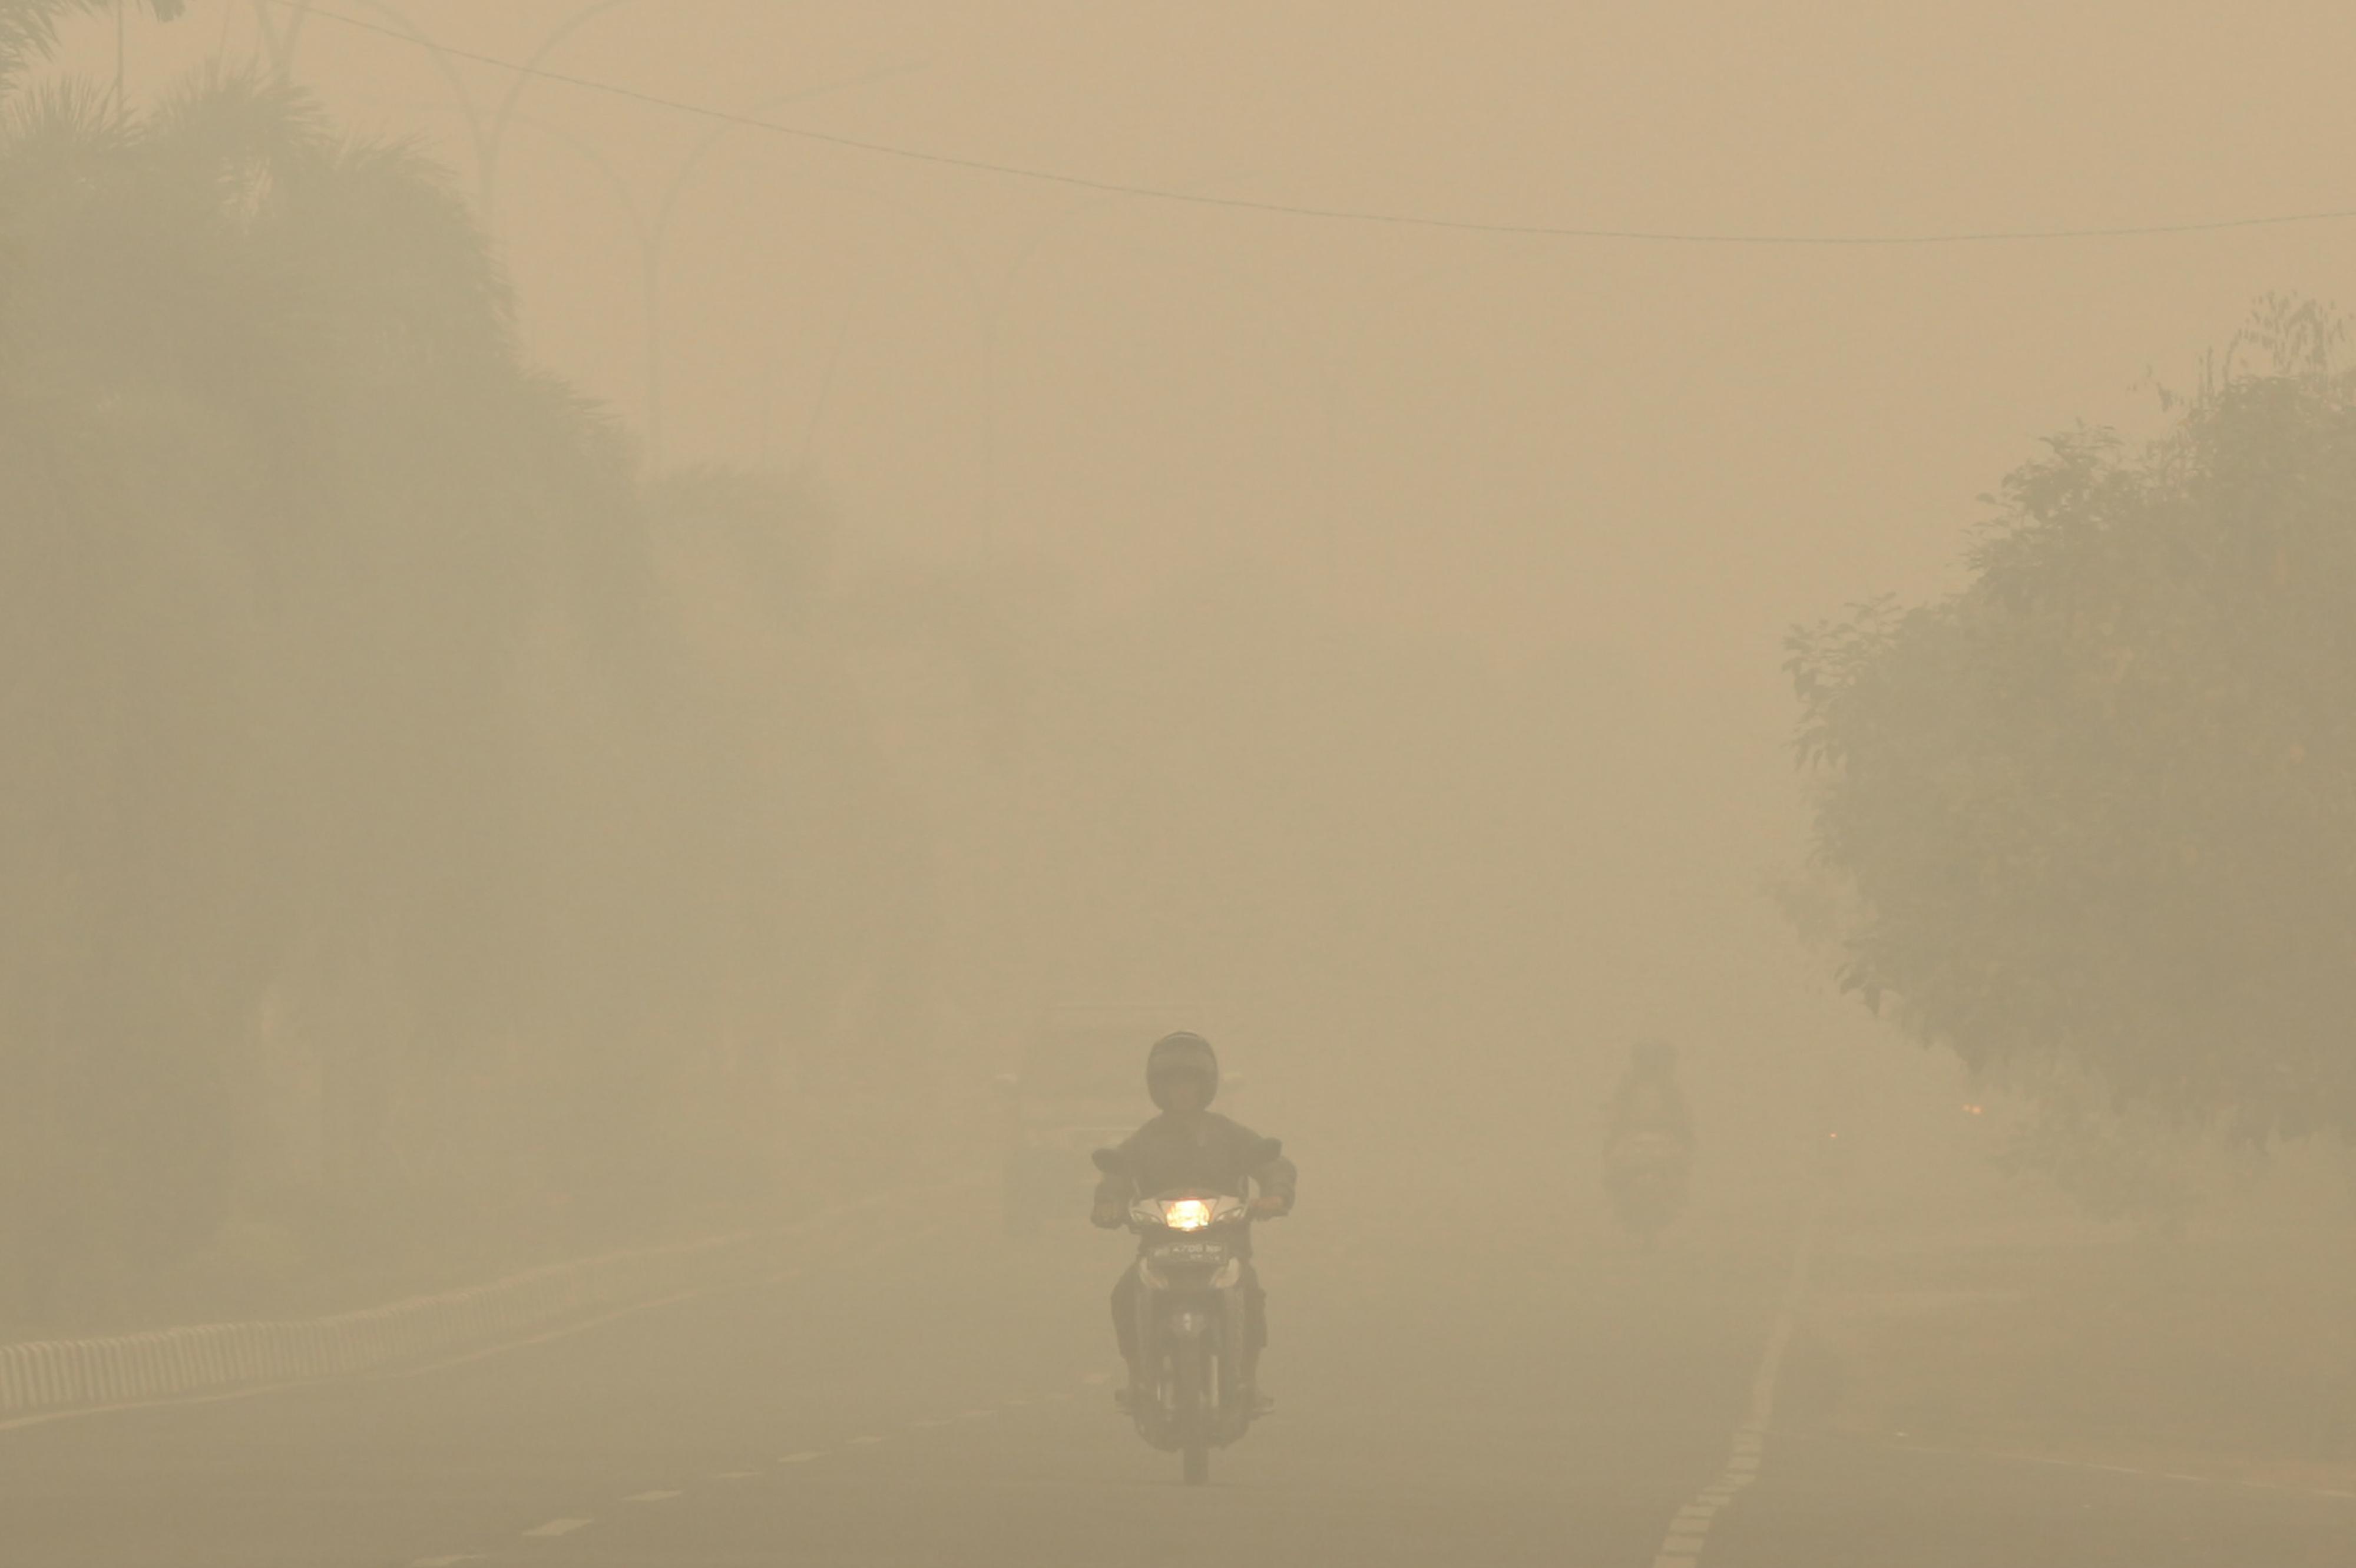 INDONESIA-MALAYSIA-SINGAPORE-ENVIRONMENT-HAZE